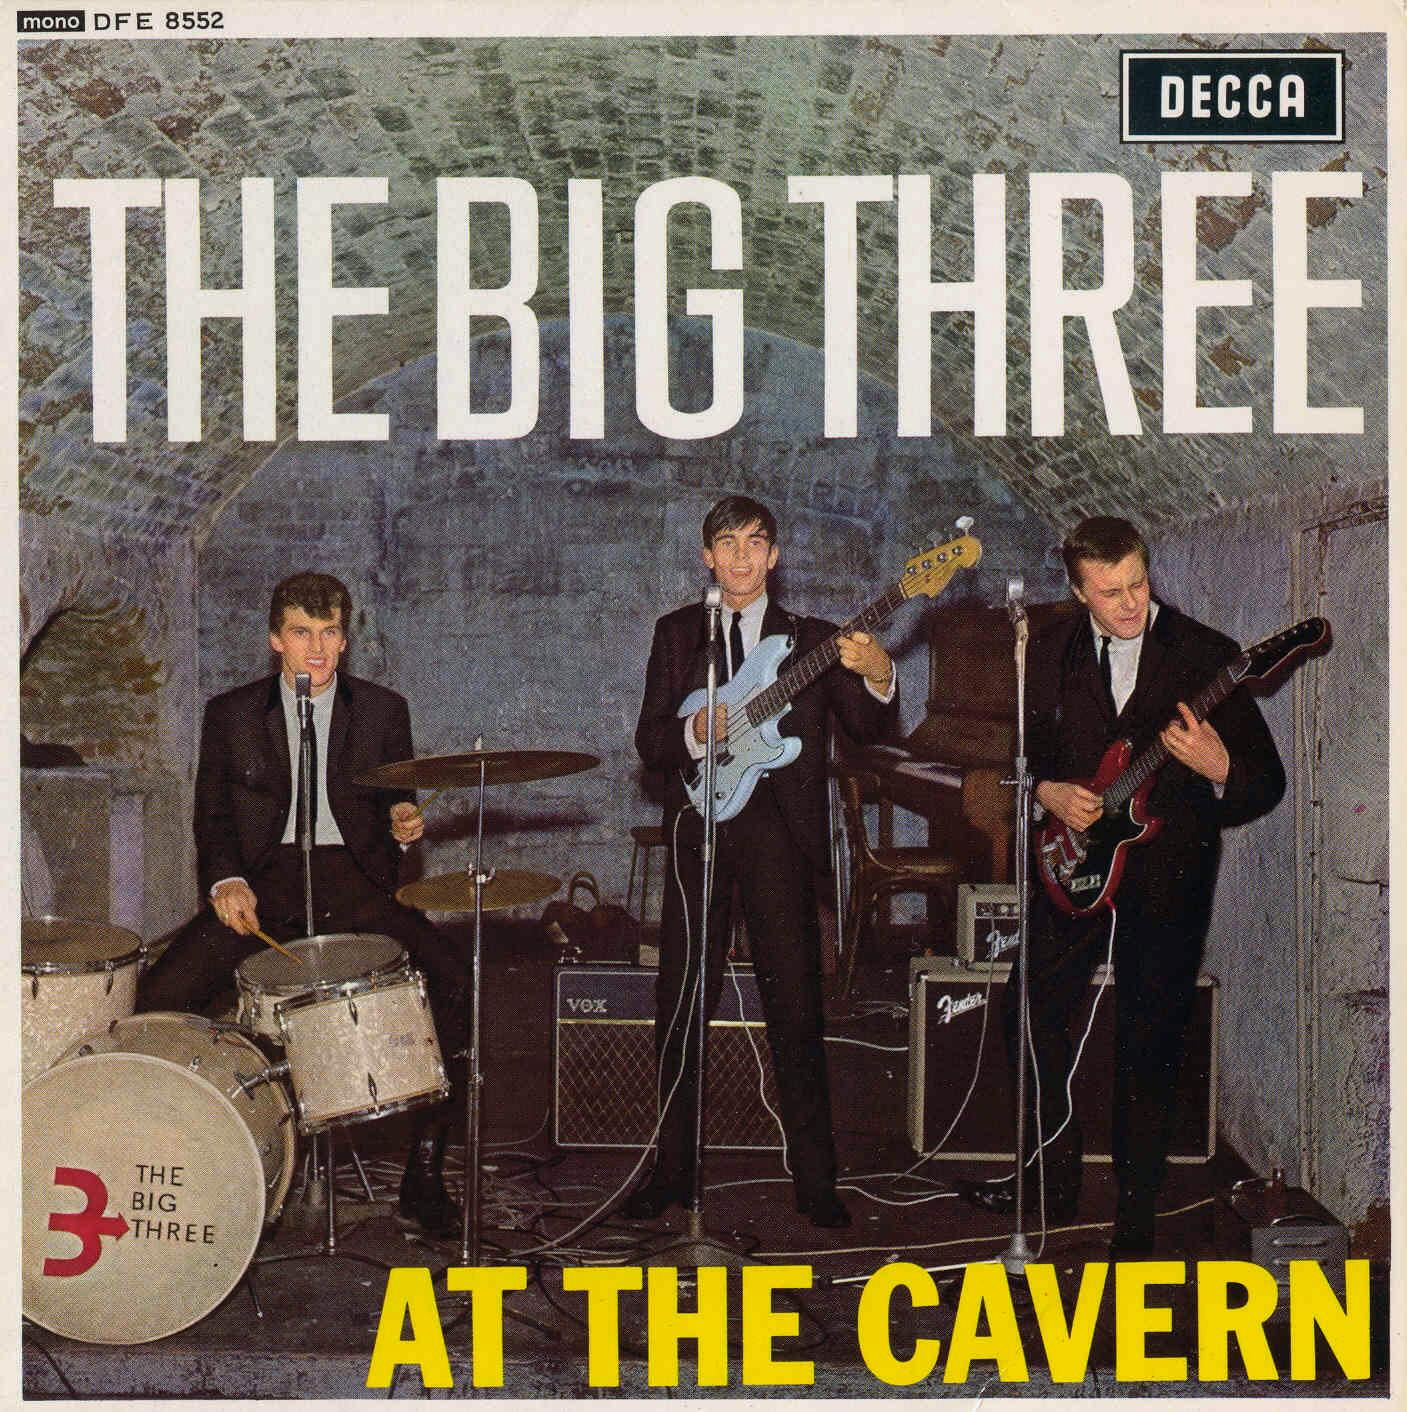 the-big-three-at-the-cavern-decca